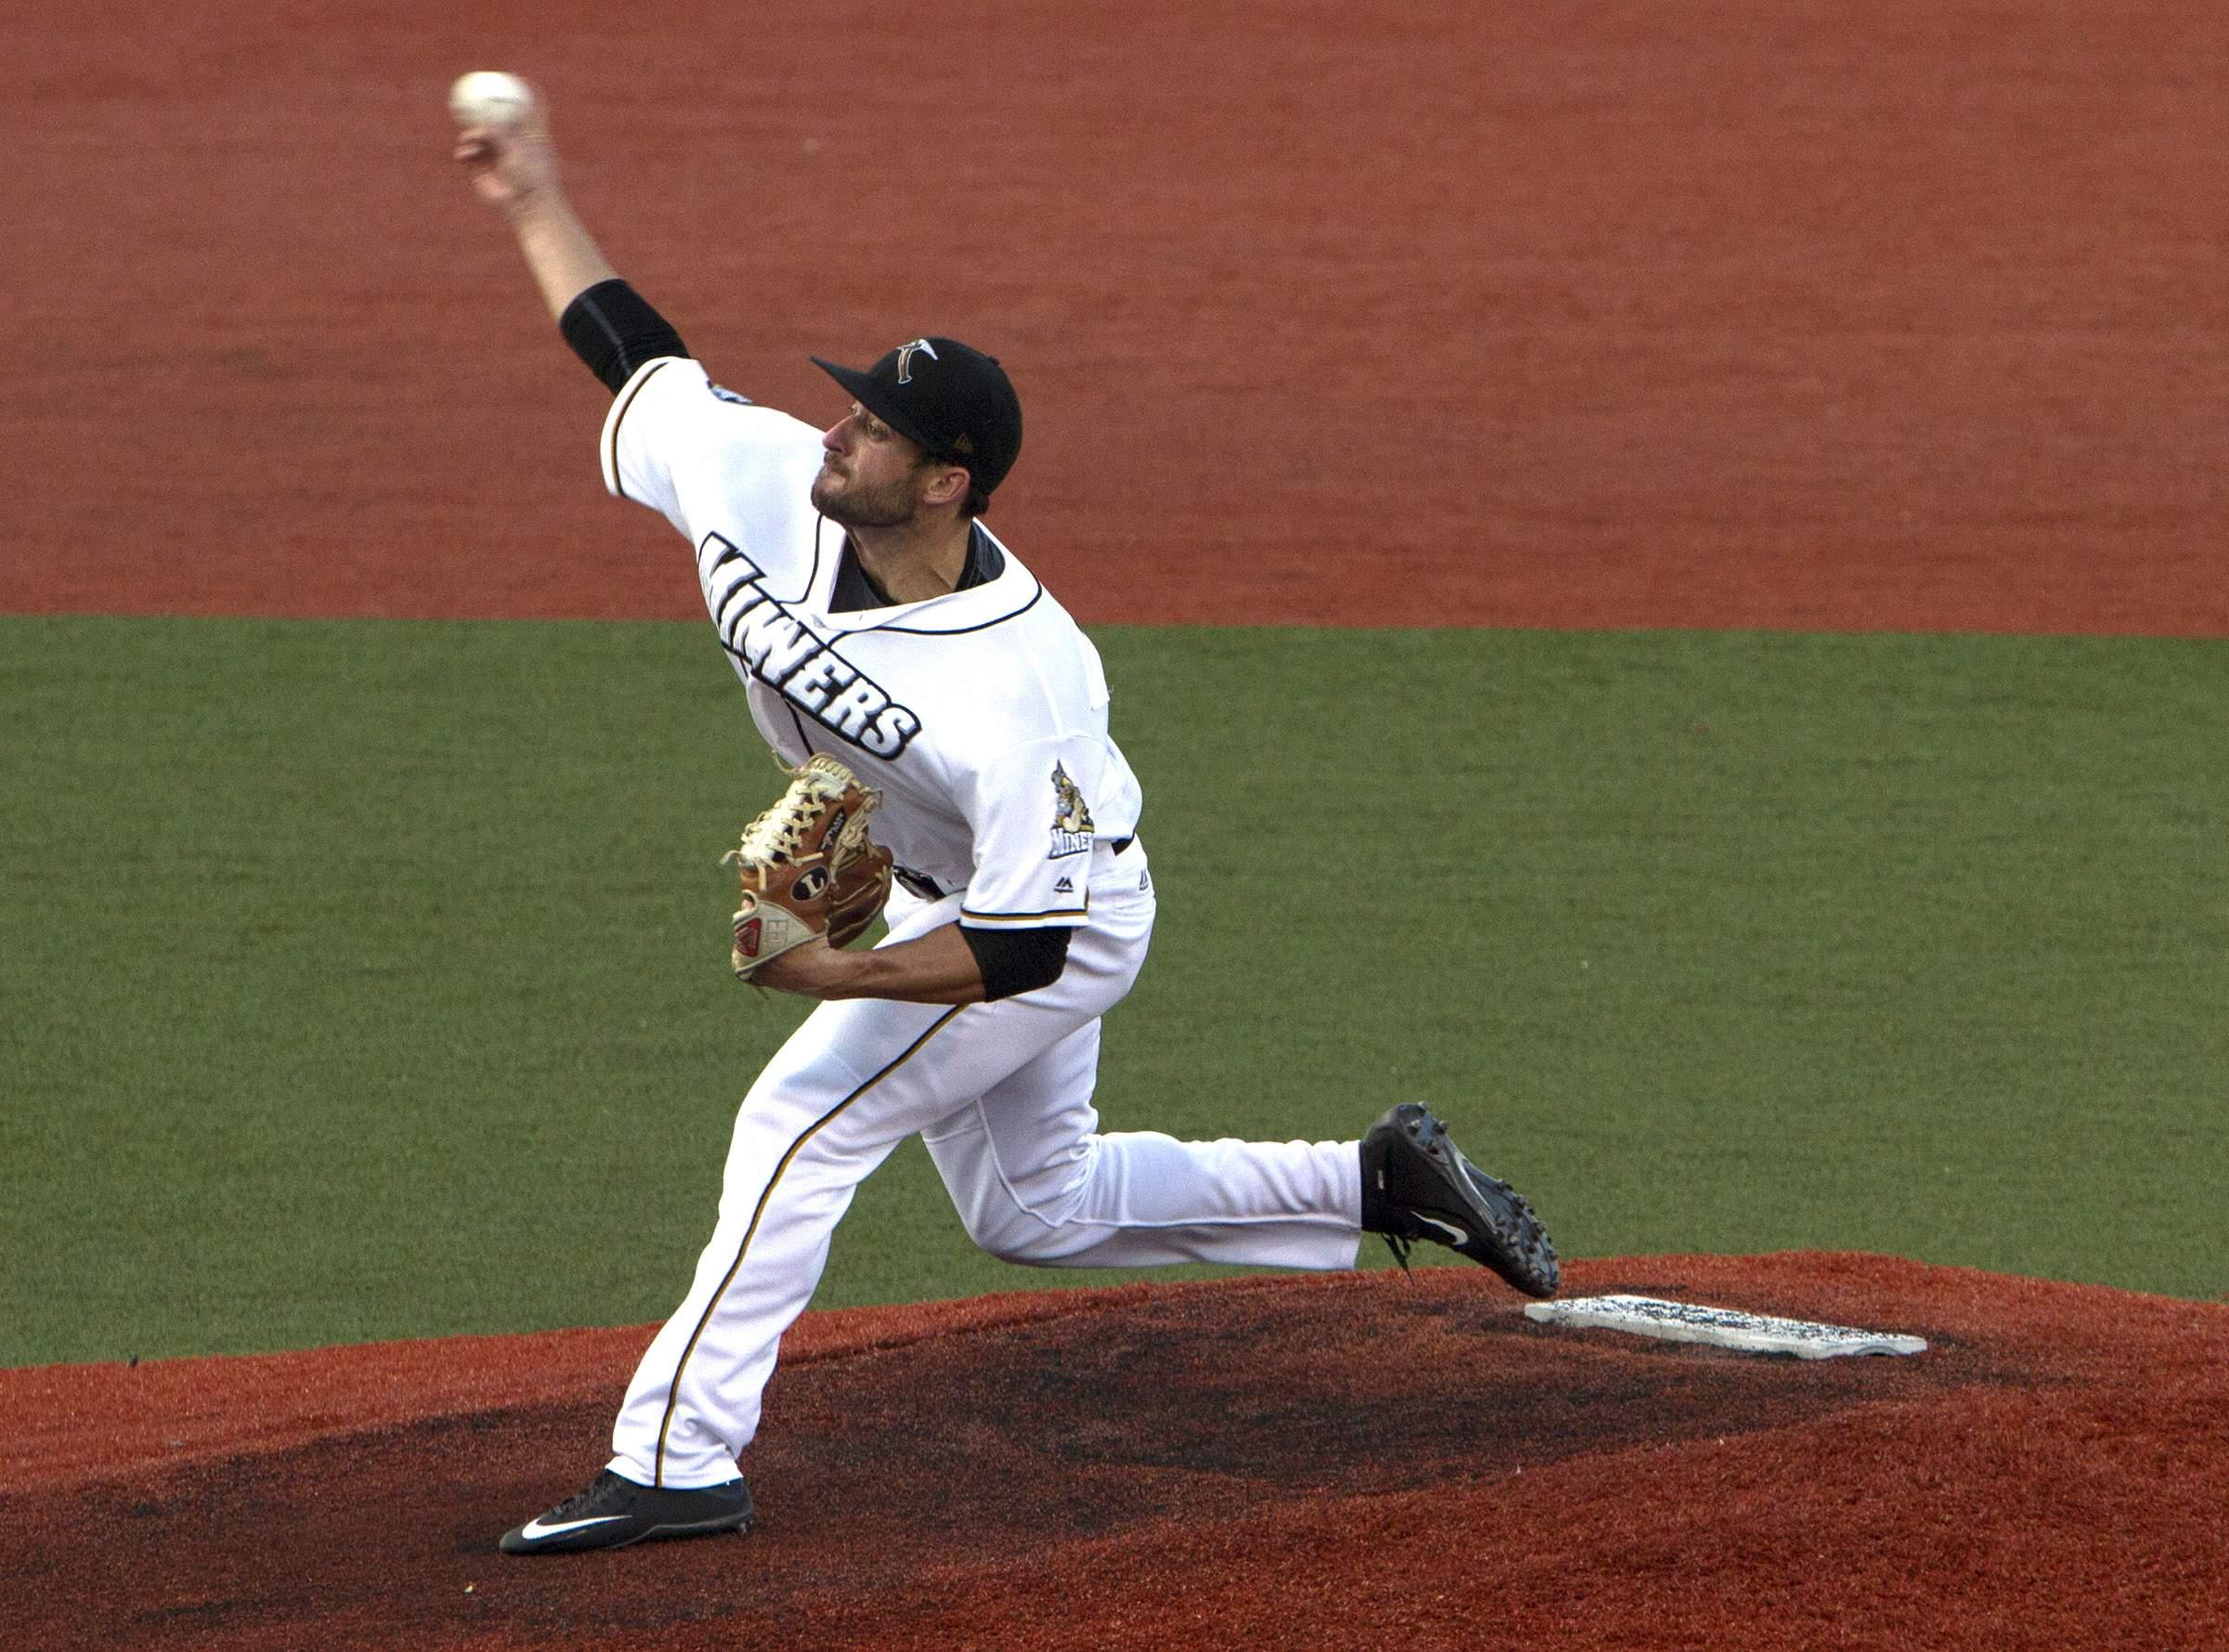 Zach Cooper throws a pitch.